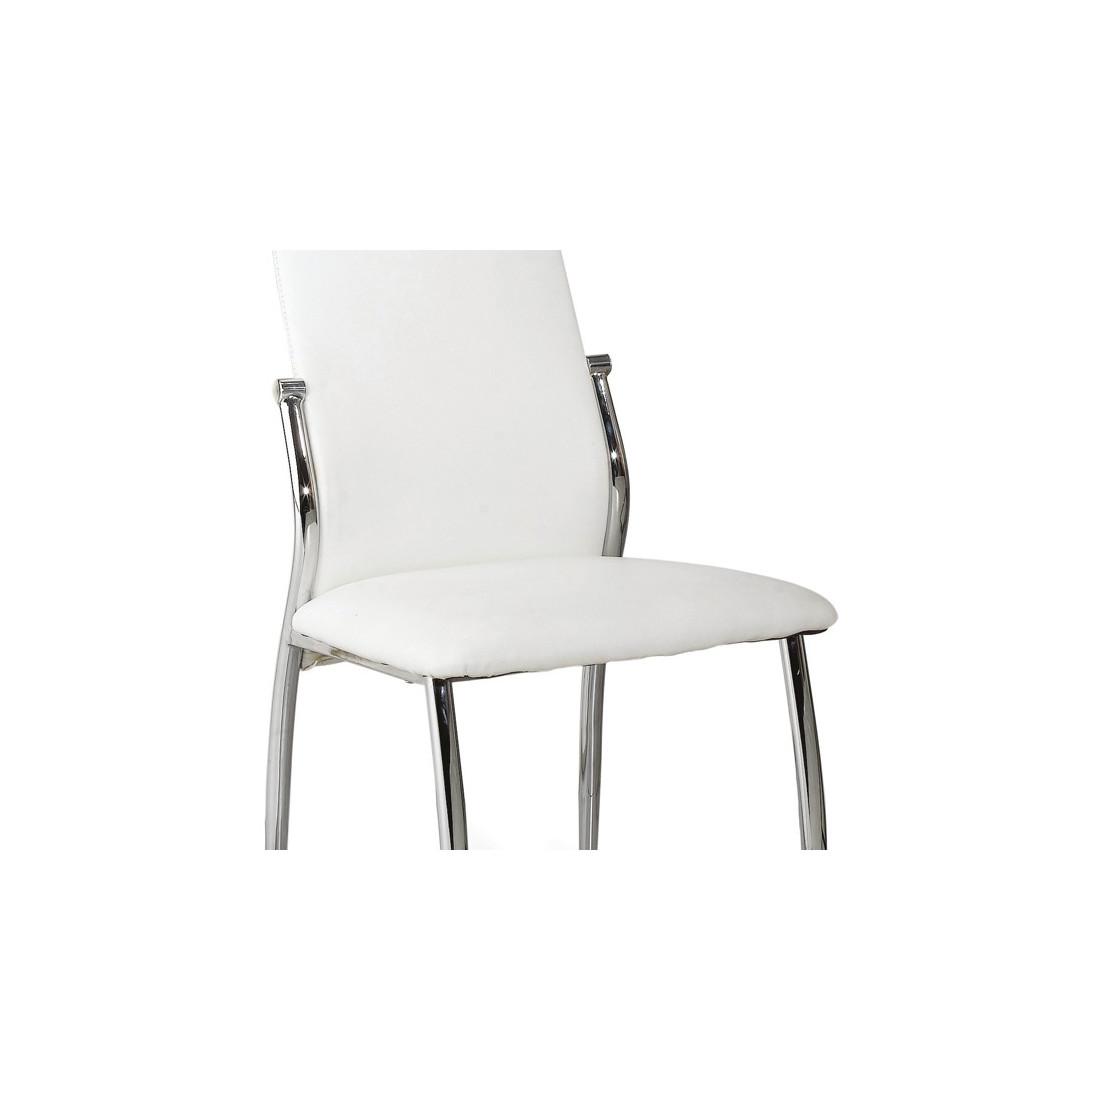 Mobilier Table Chaises Simili Cuir Blanc